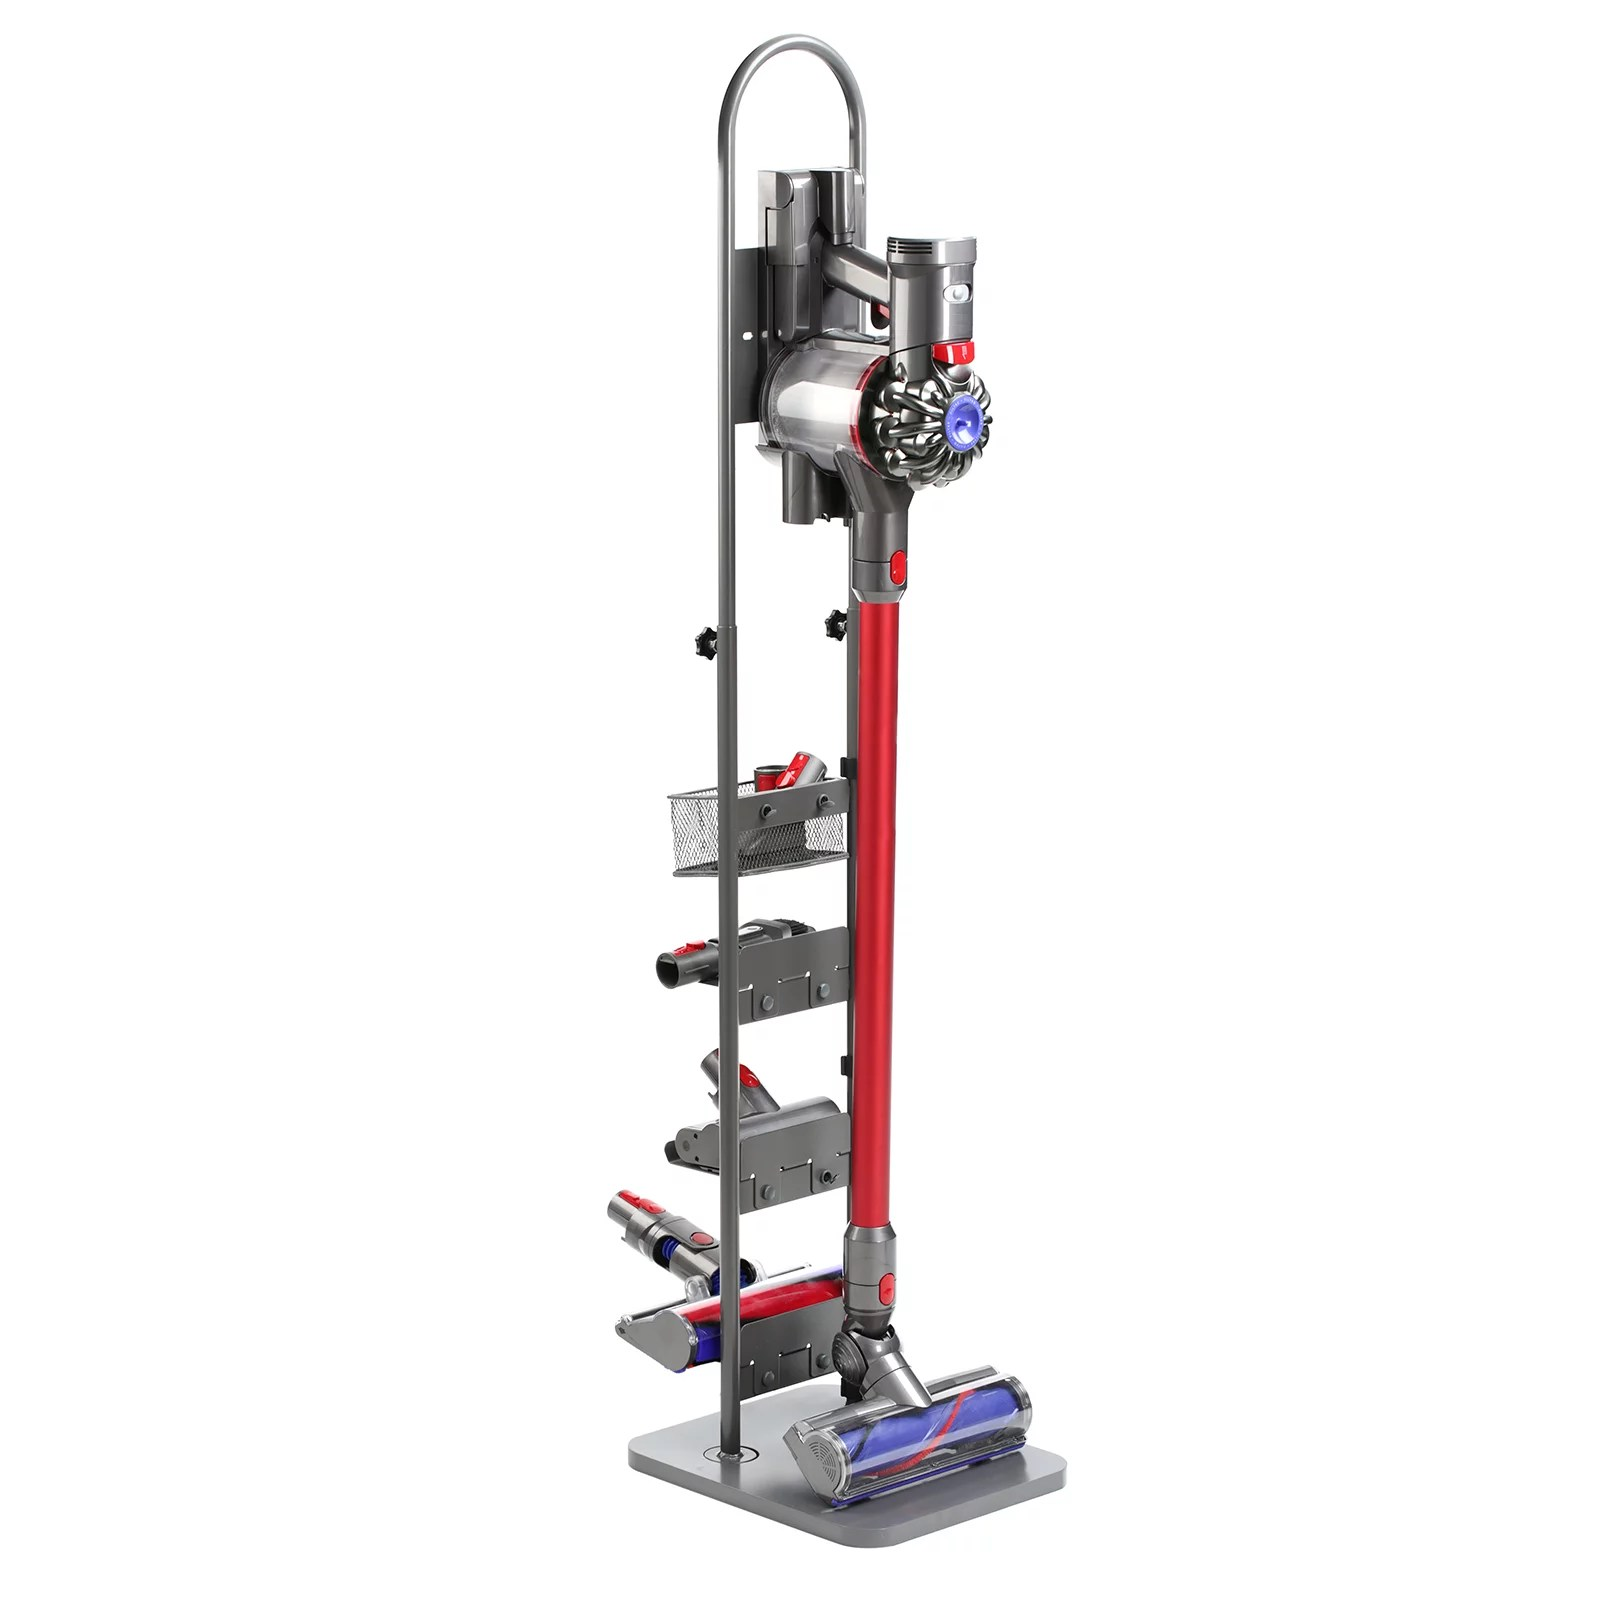 Docking Station Amp Tools Floor Stand For Dyson Handheld V6